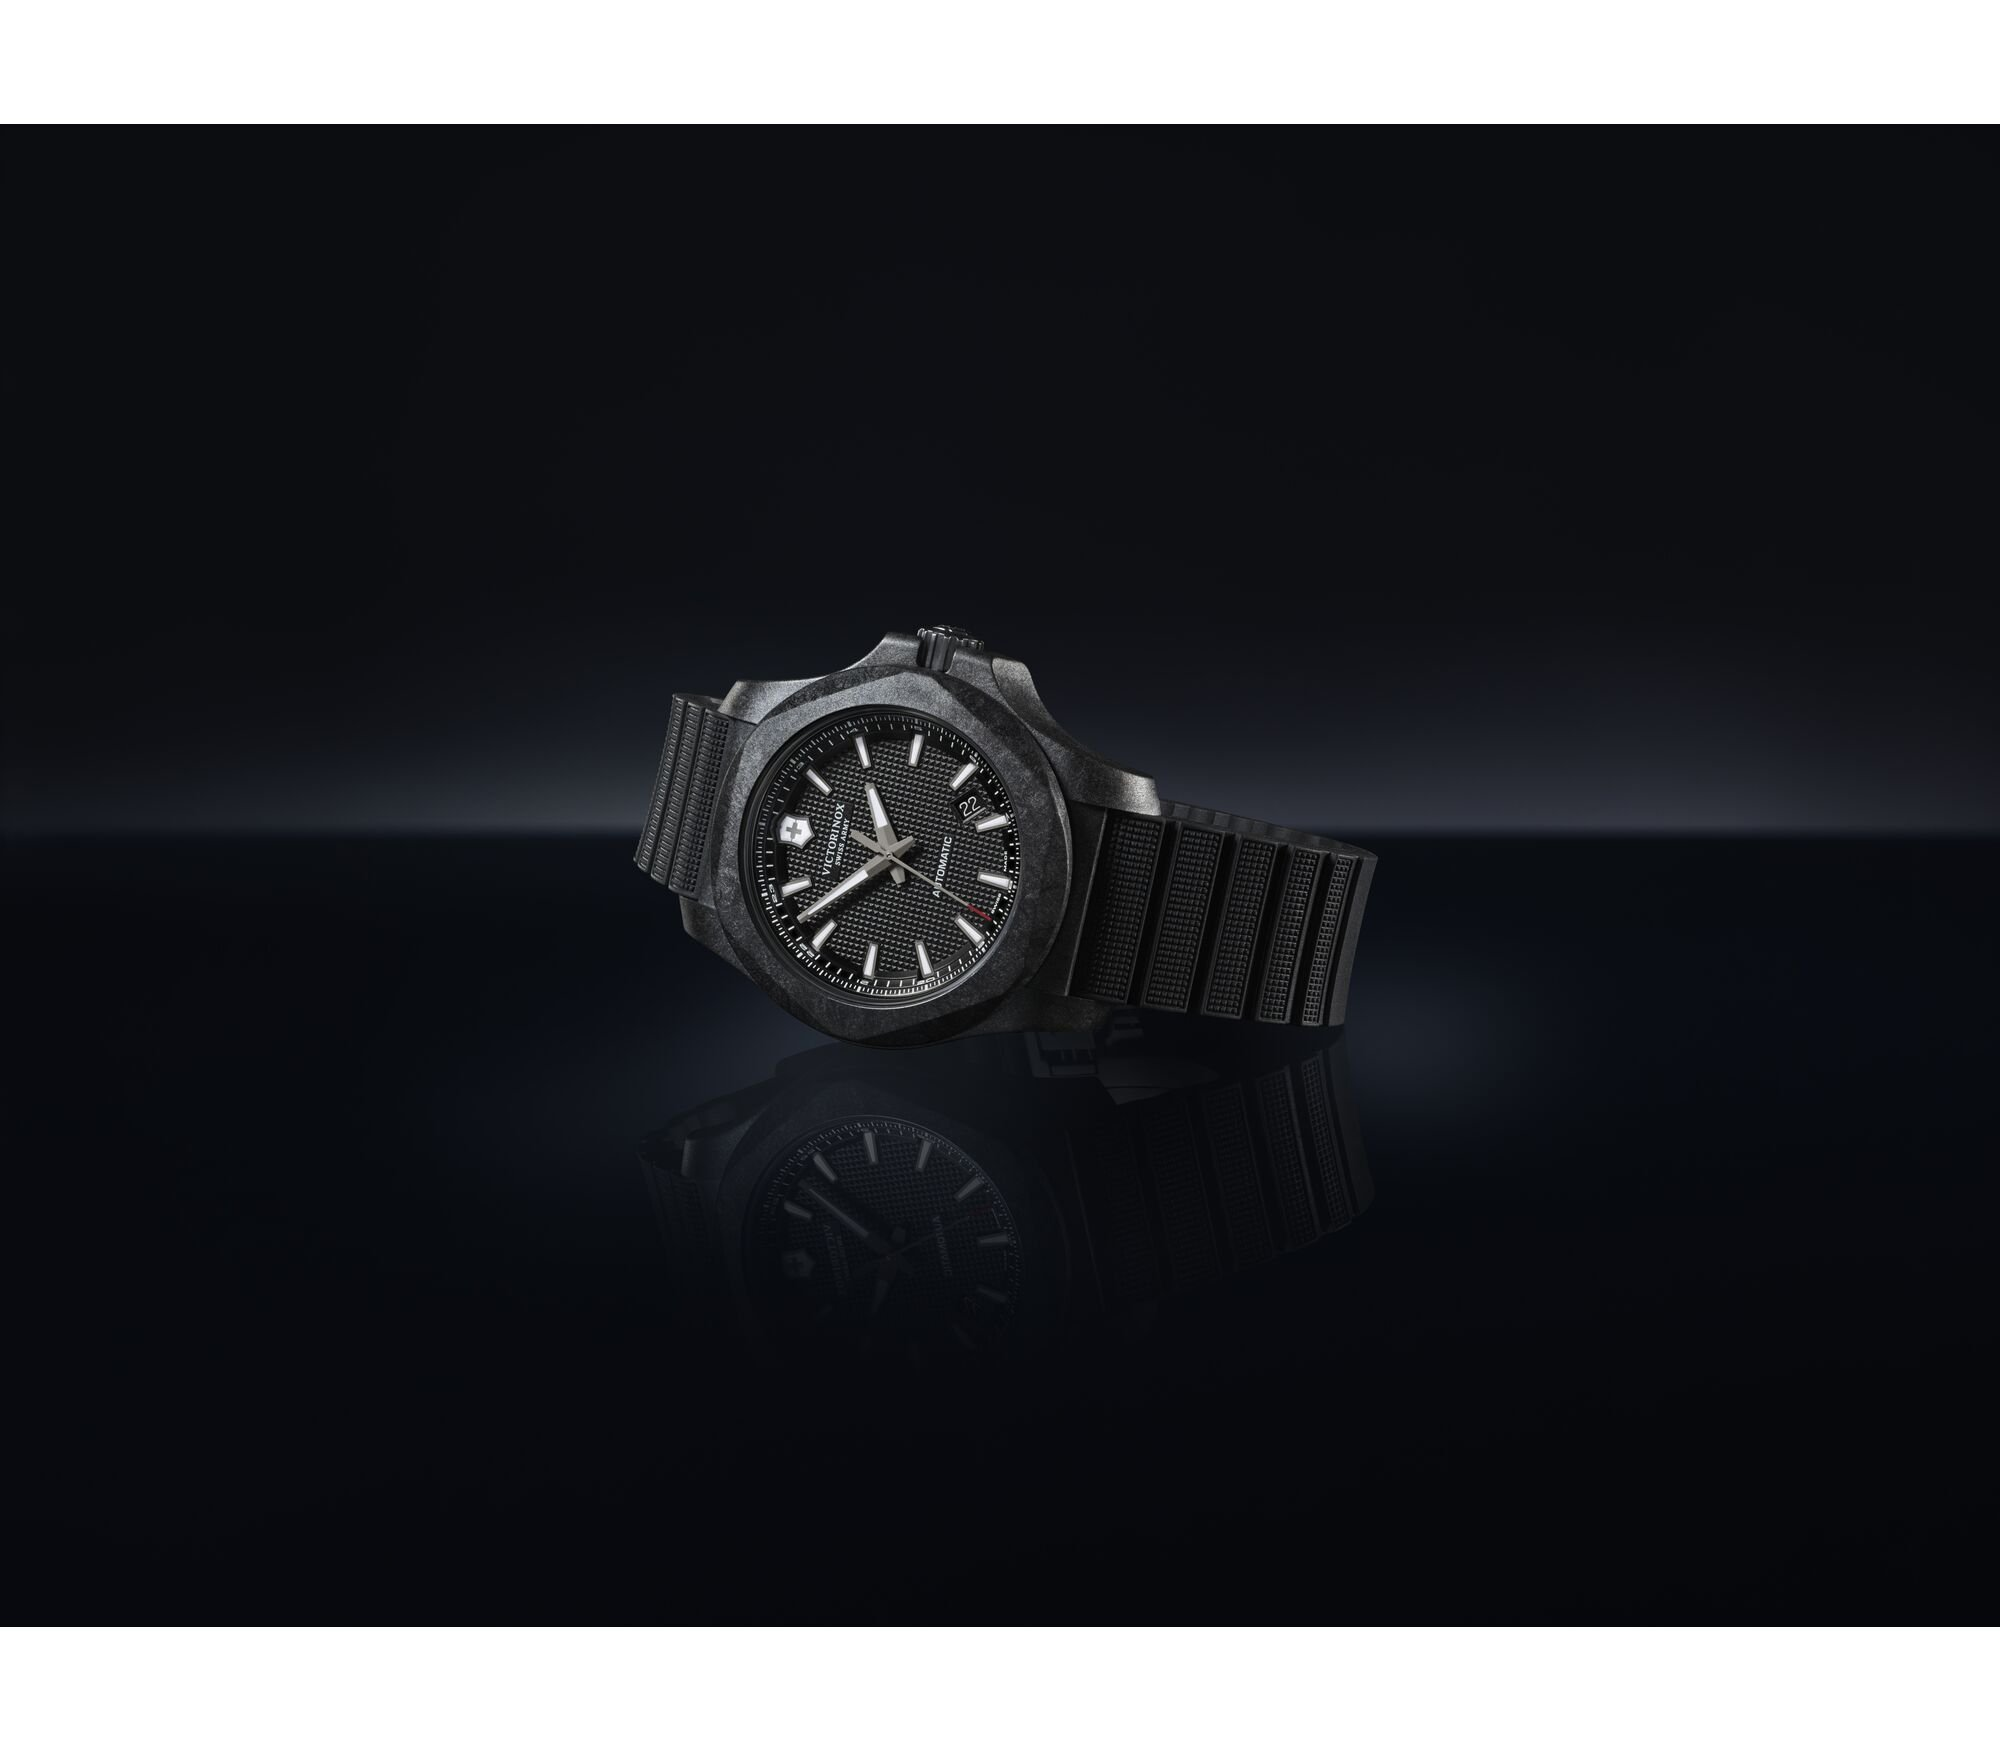 Victorinox's New I.N.O.X. Carbon Mechanical Watch